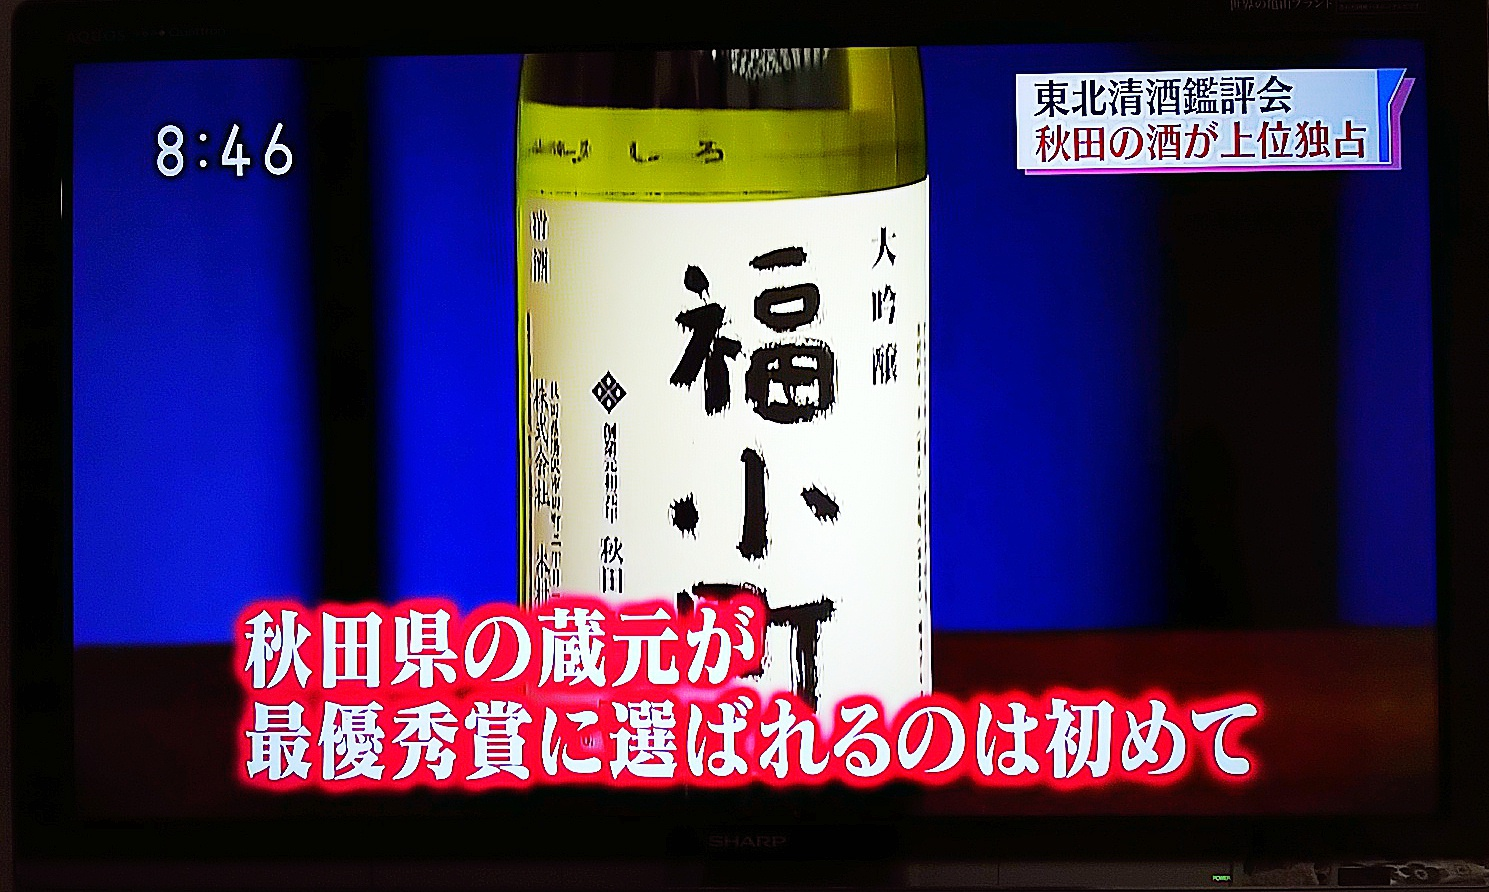 http://www.fukukomachi.com/blog/photo/C360_2018-11-09-21-10-11-858.jpg